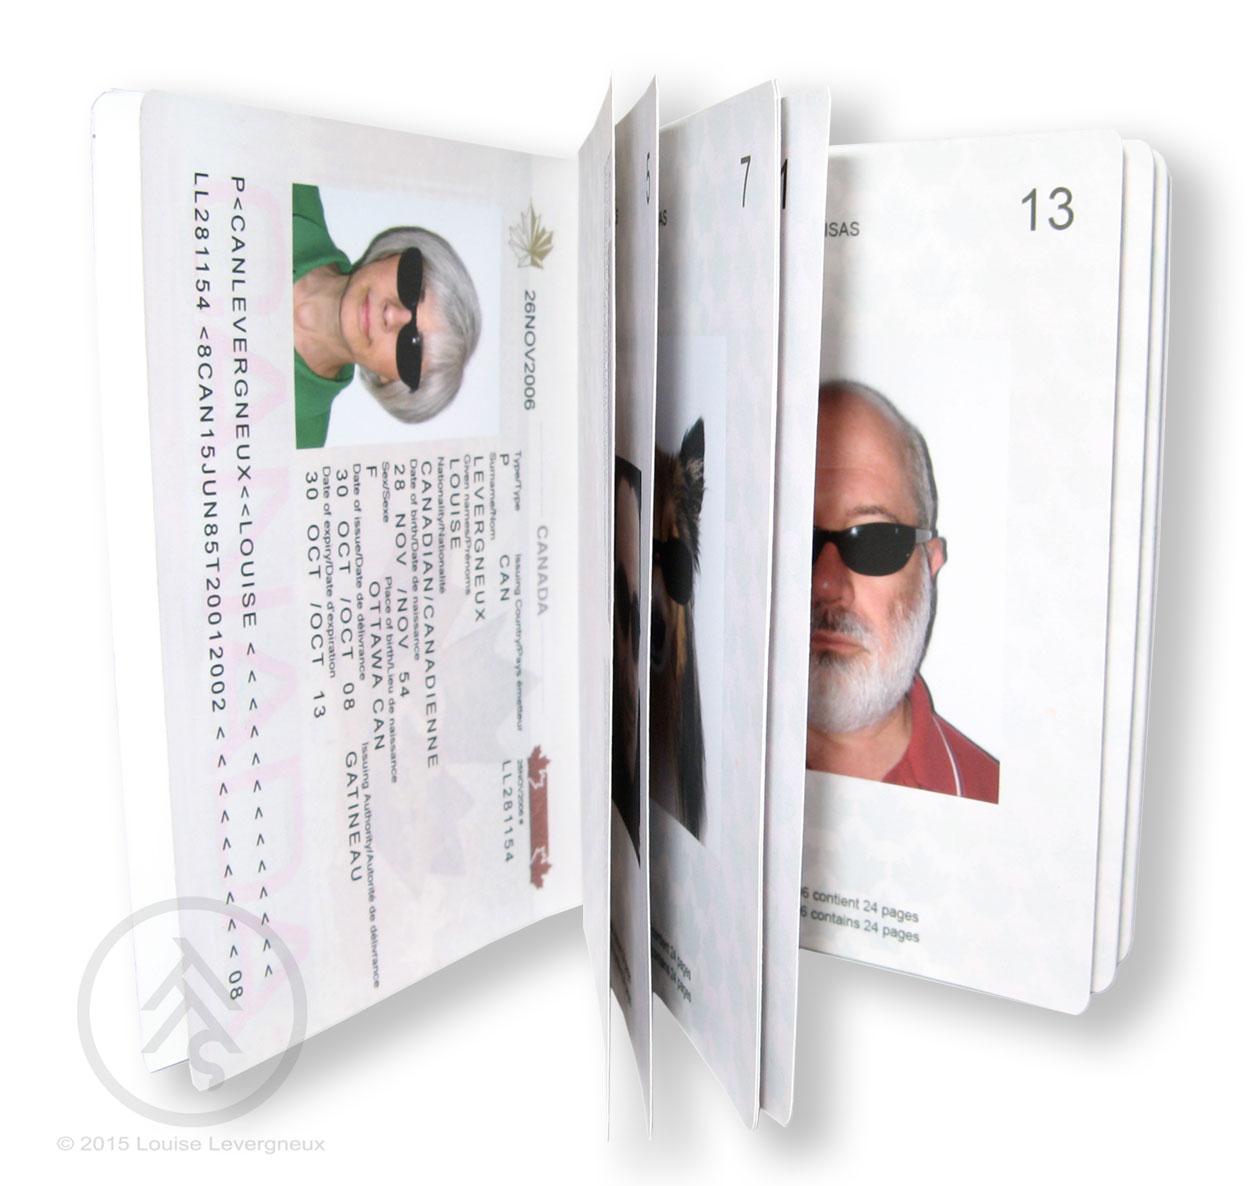 06-Levergneux-26NOV2006-Open-book_WEB.jpg